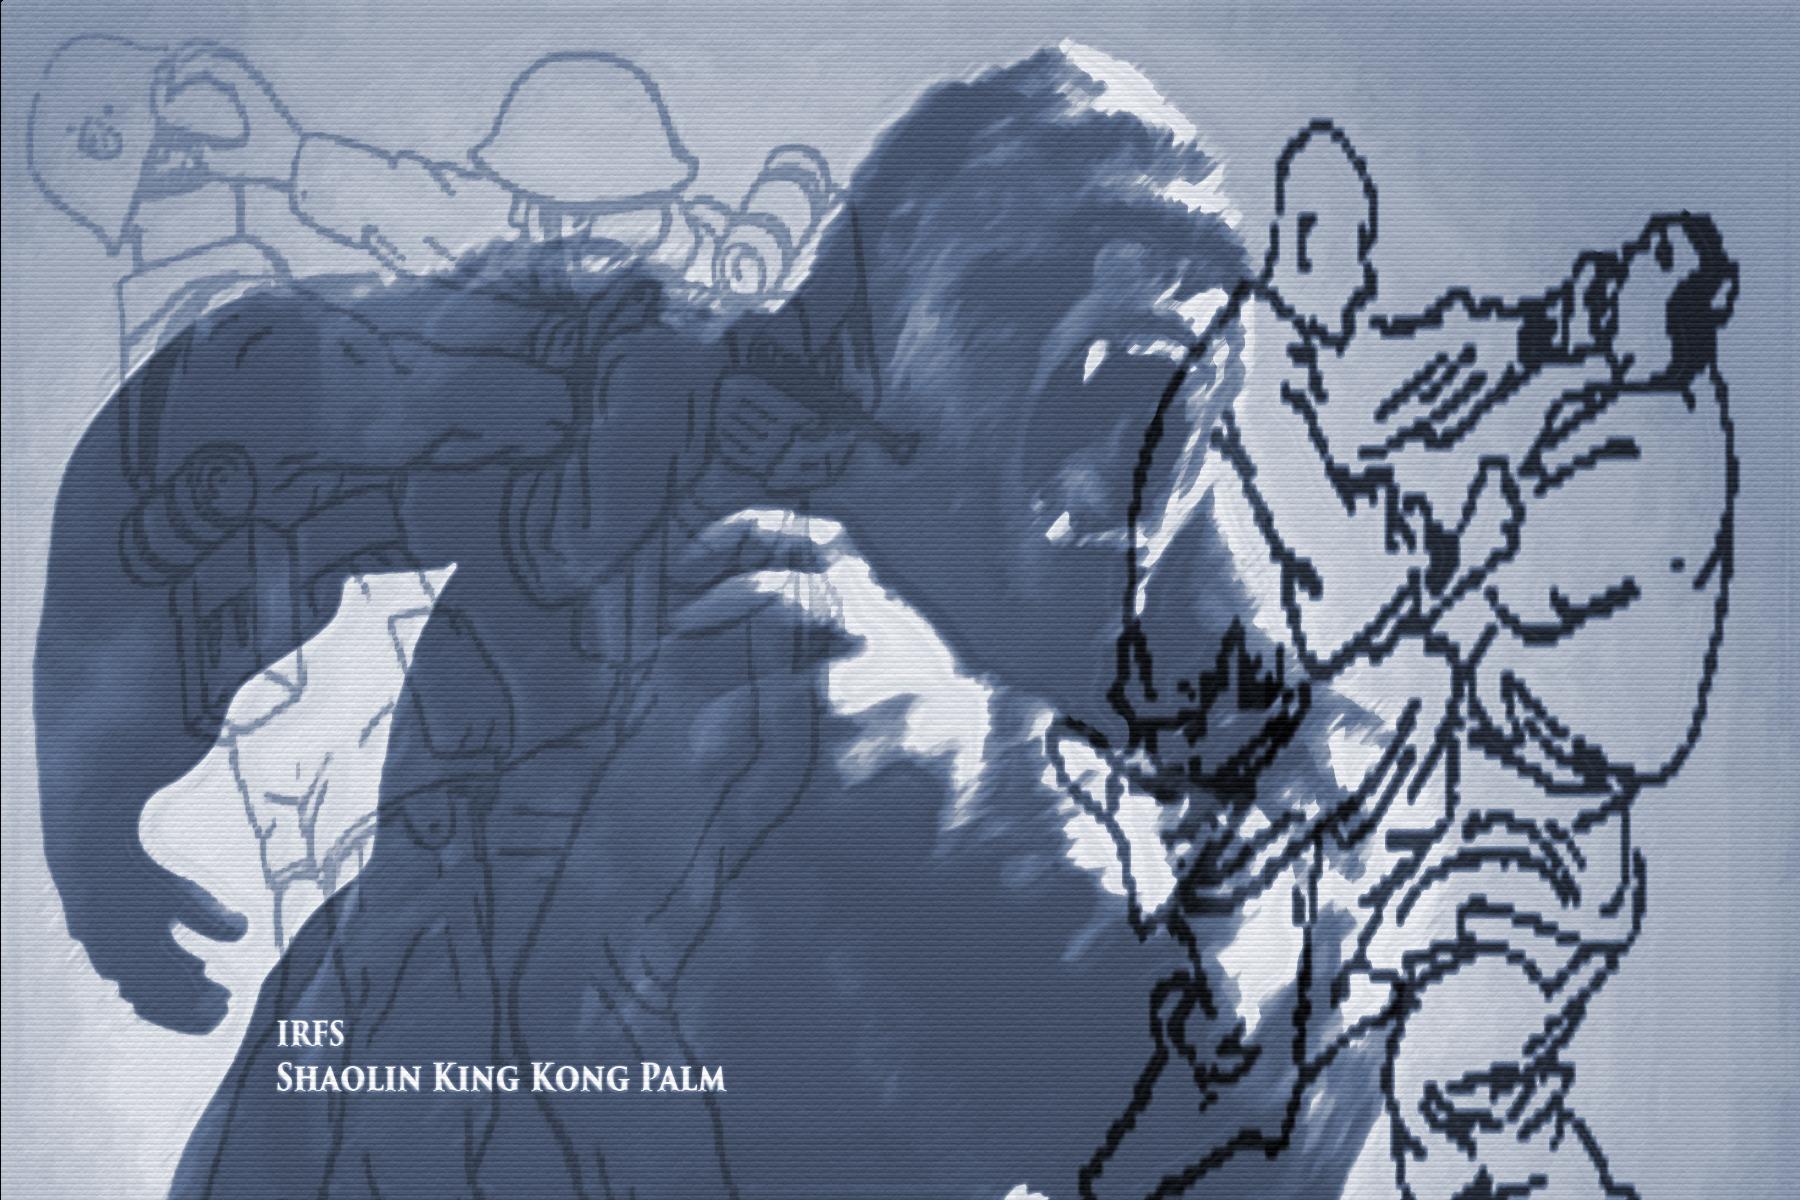 IRFS- KingKong